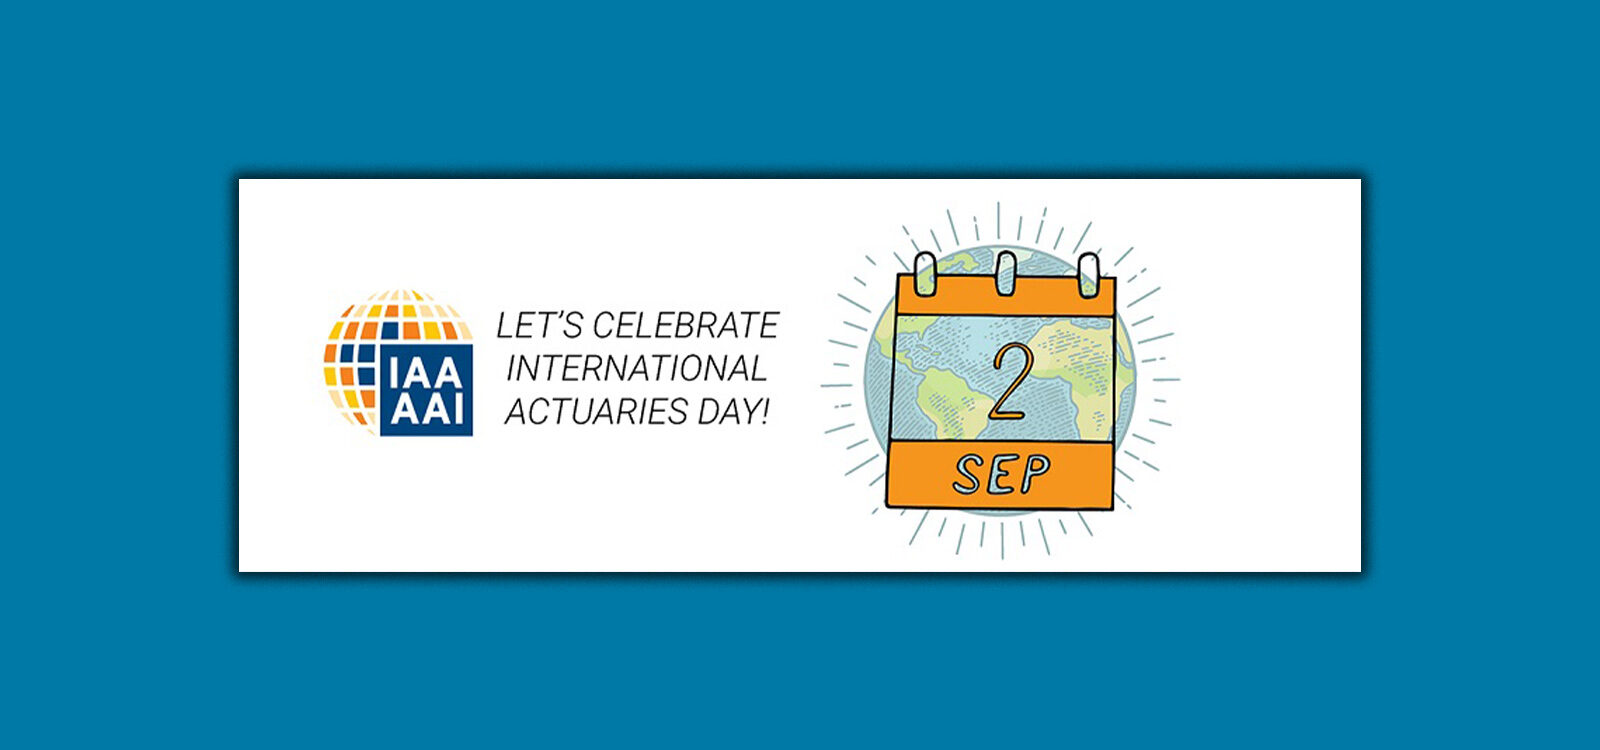 Celebrating International Actuaries Day